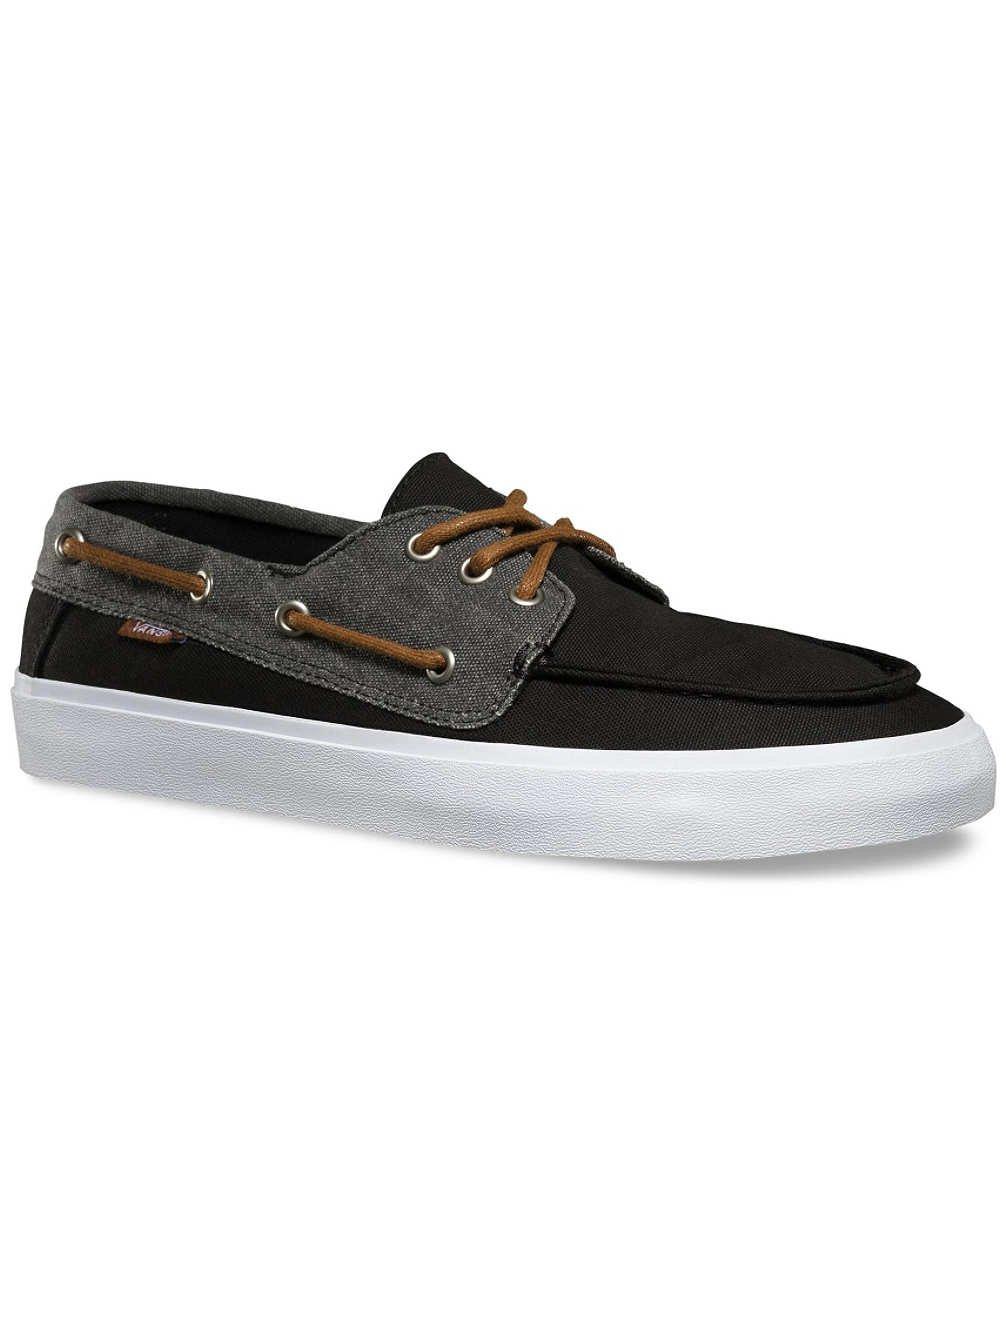 Galleon - Vans Chauffeur SF (Washed Black True White) Men s Skate Shoes-11.5 70fc361c4